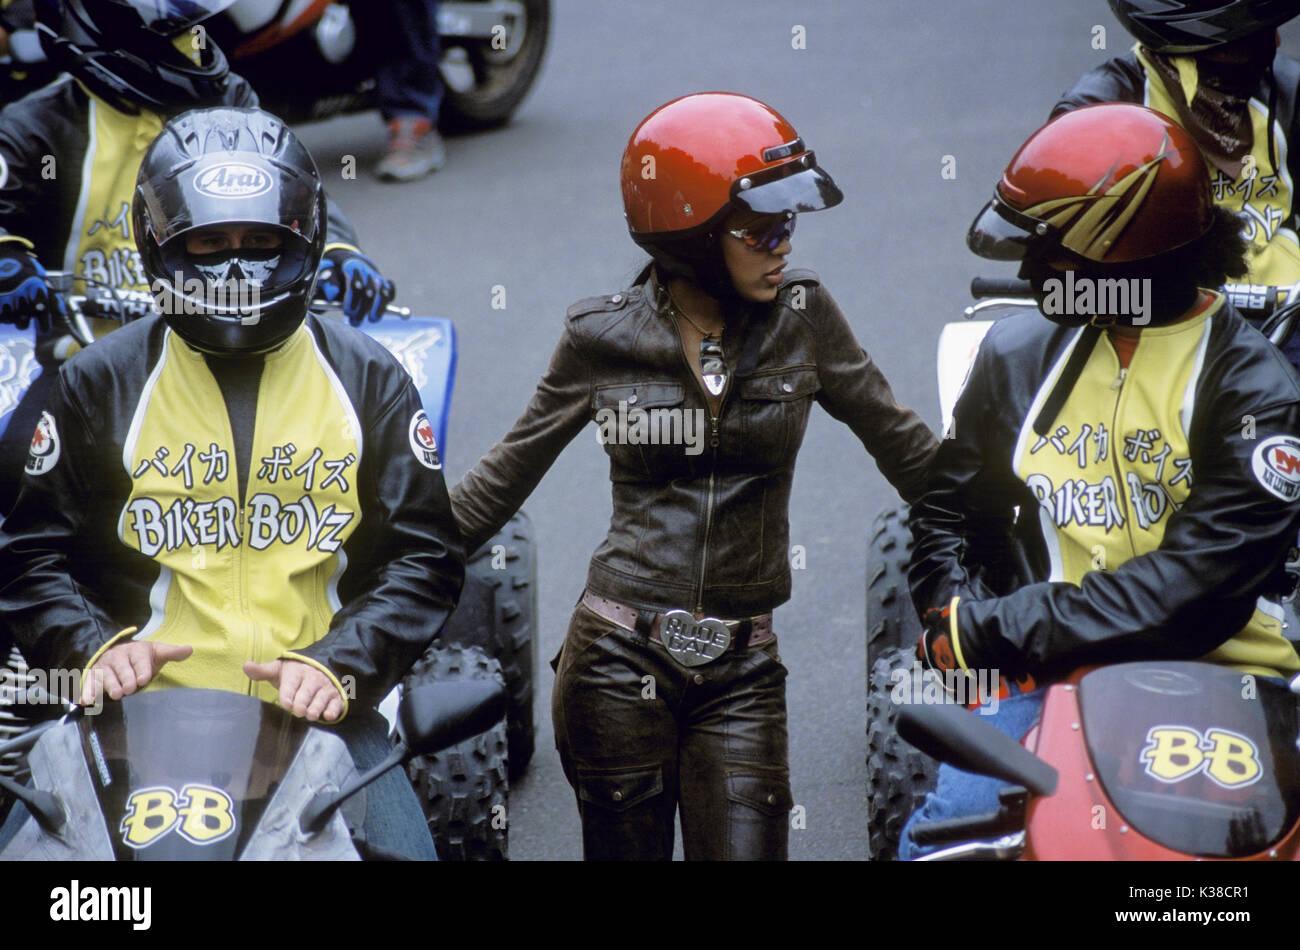 Tina gets between two members of the motorcycle racing Biker Boyz: Stuntman and Primo (RICK GONZALEZ), in BIKER BOYZ. - Stock Image